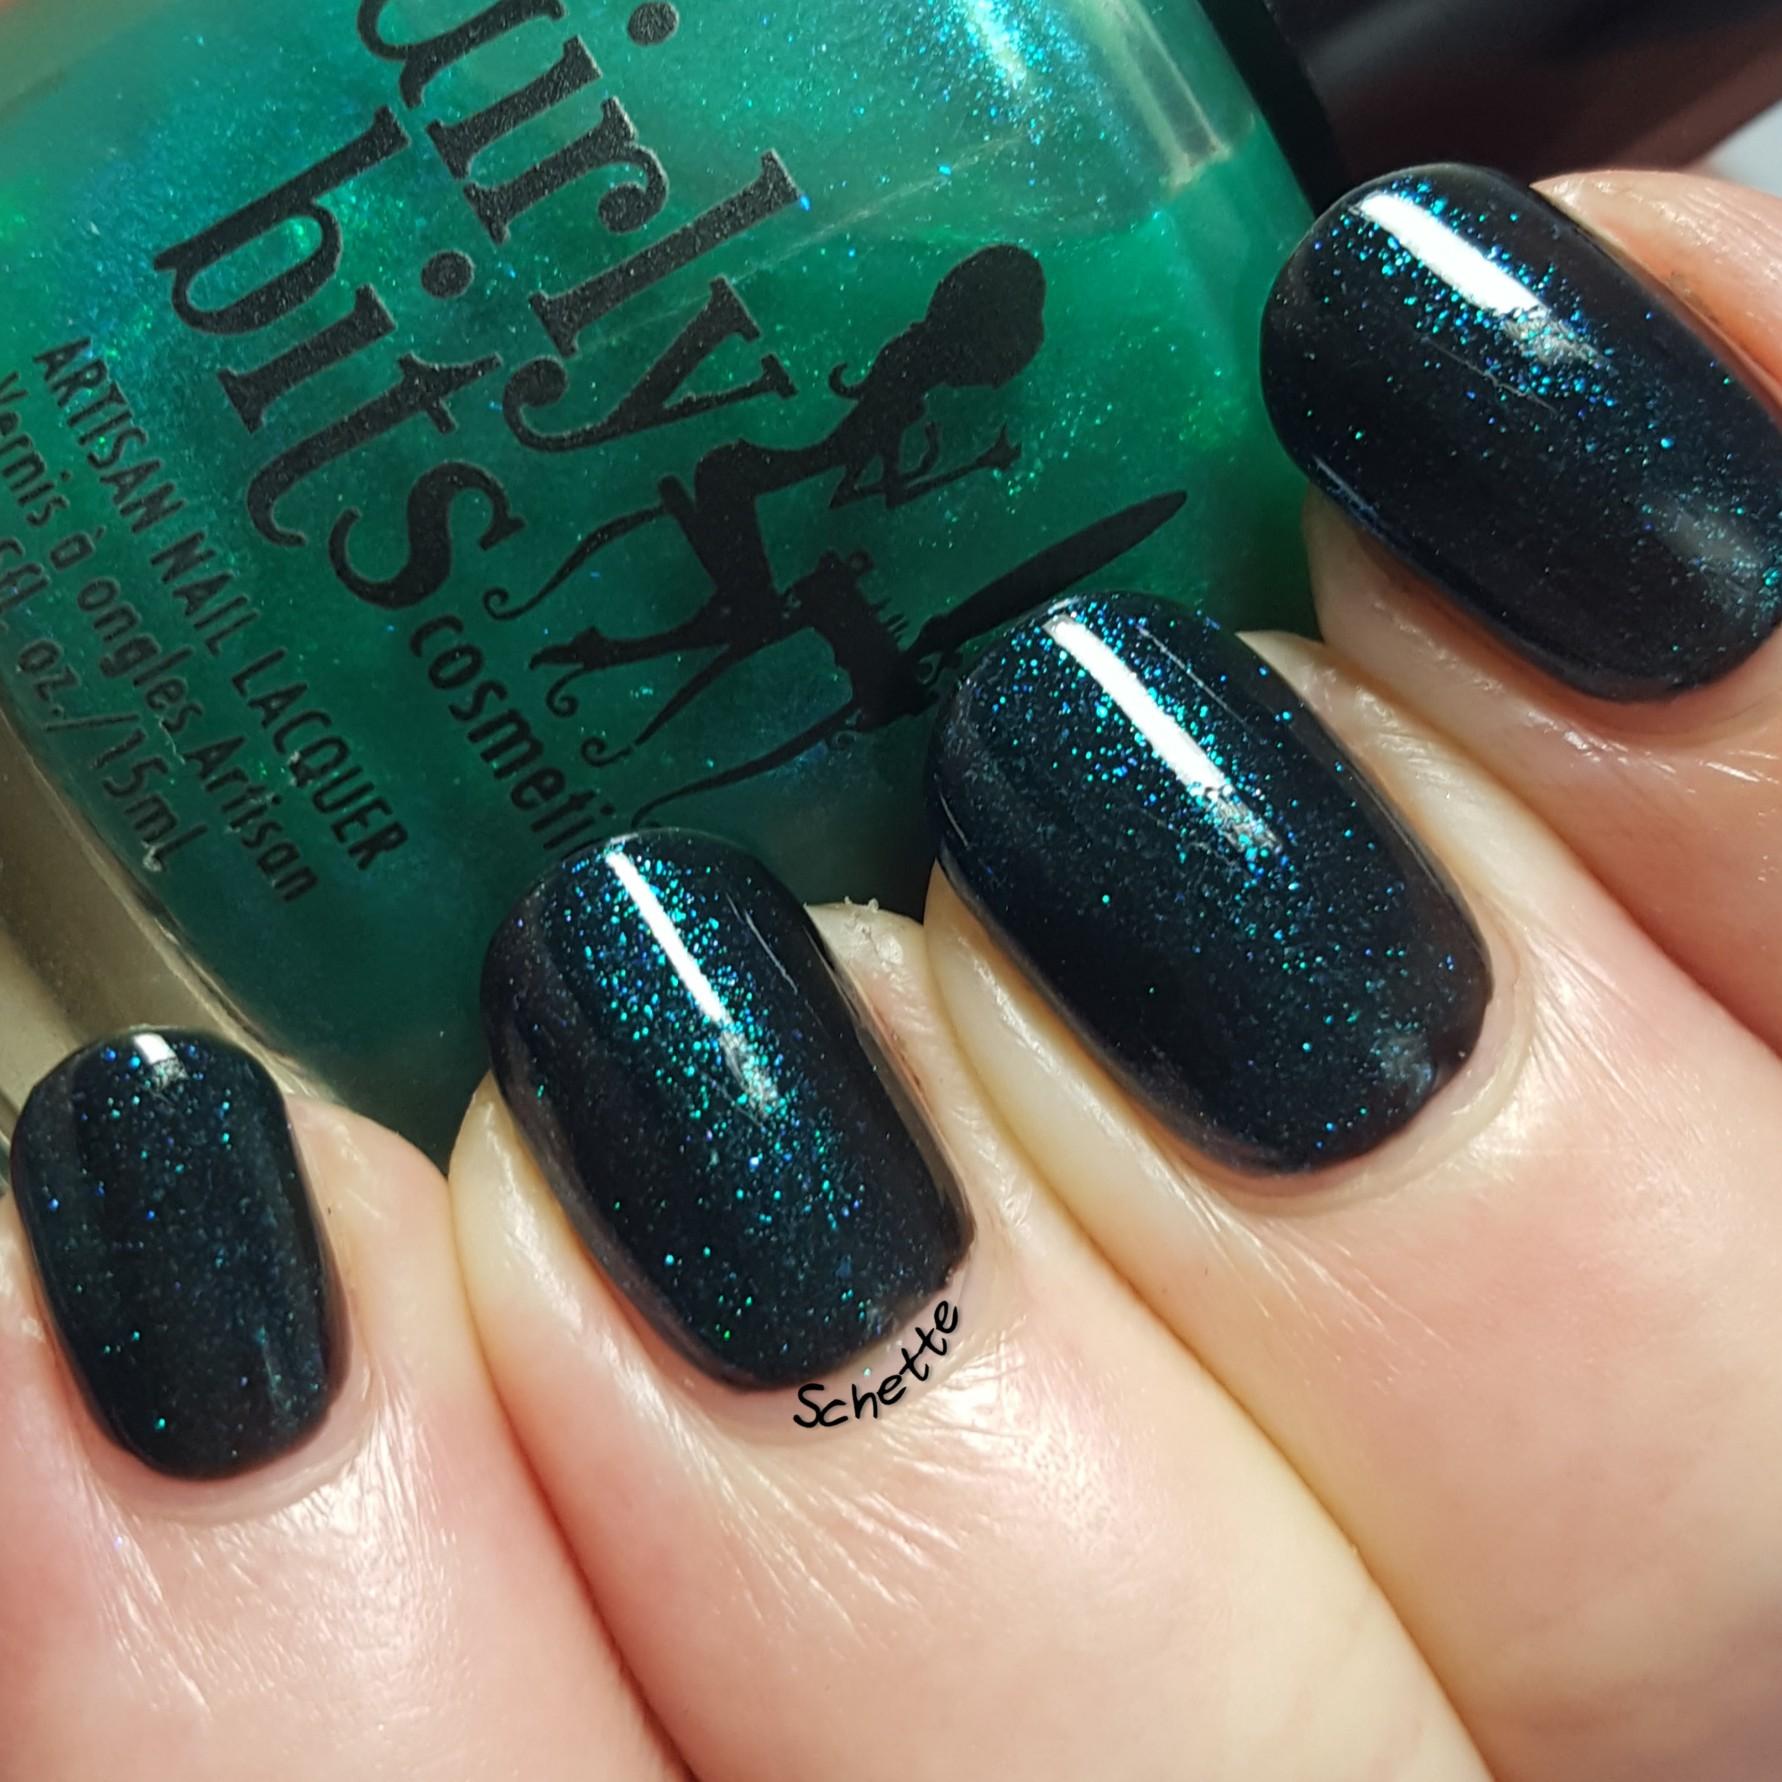 Girly Bits - Emerald city lights